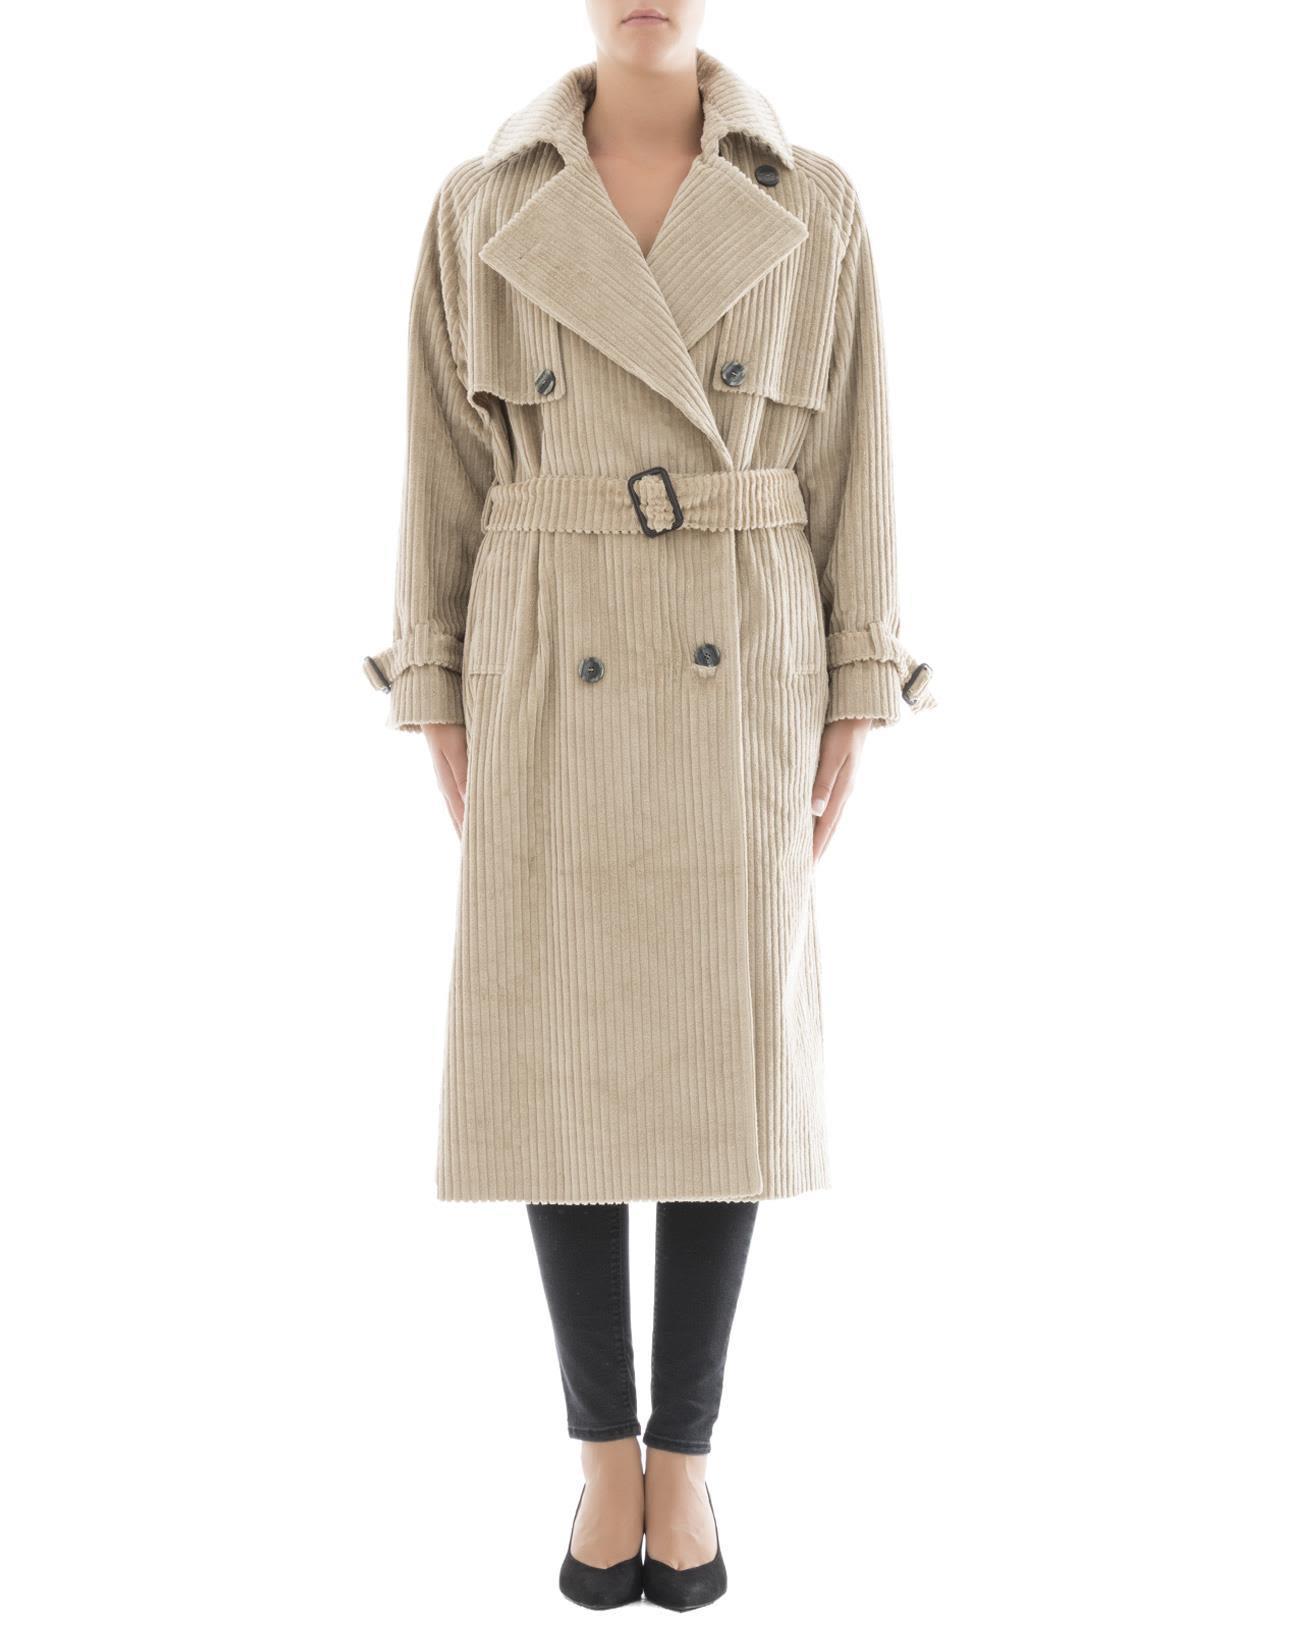 Tagliatore Beige Corduroy Raincoat